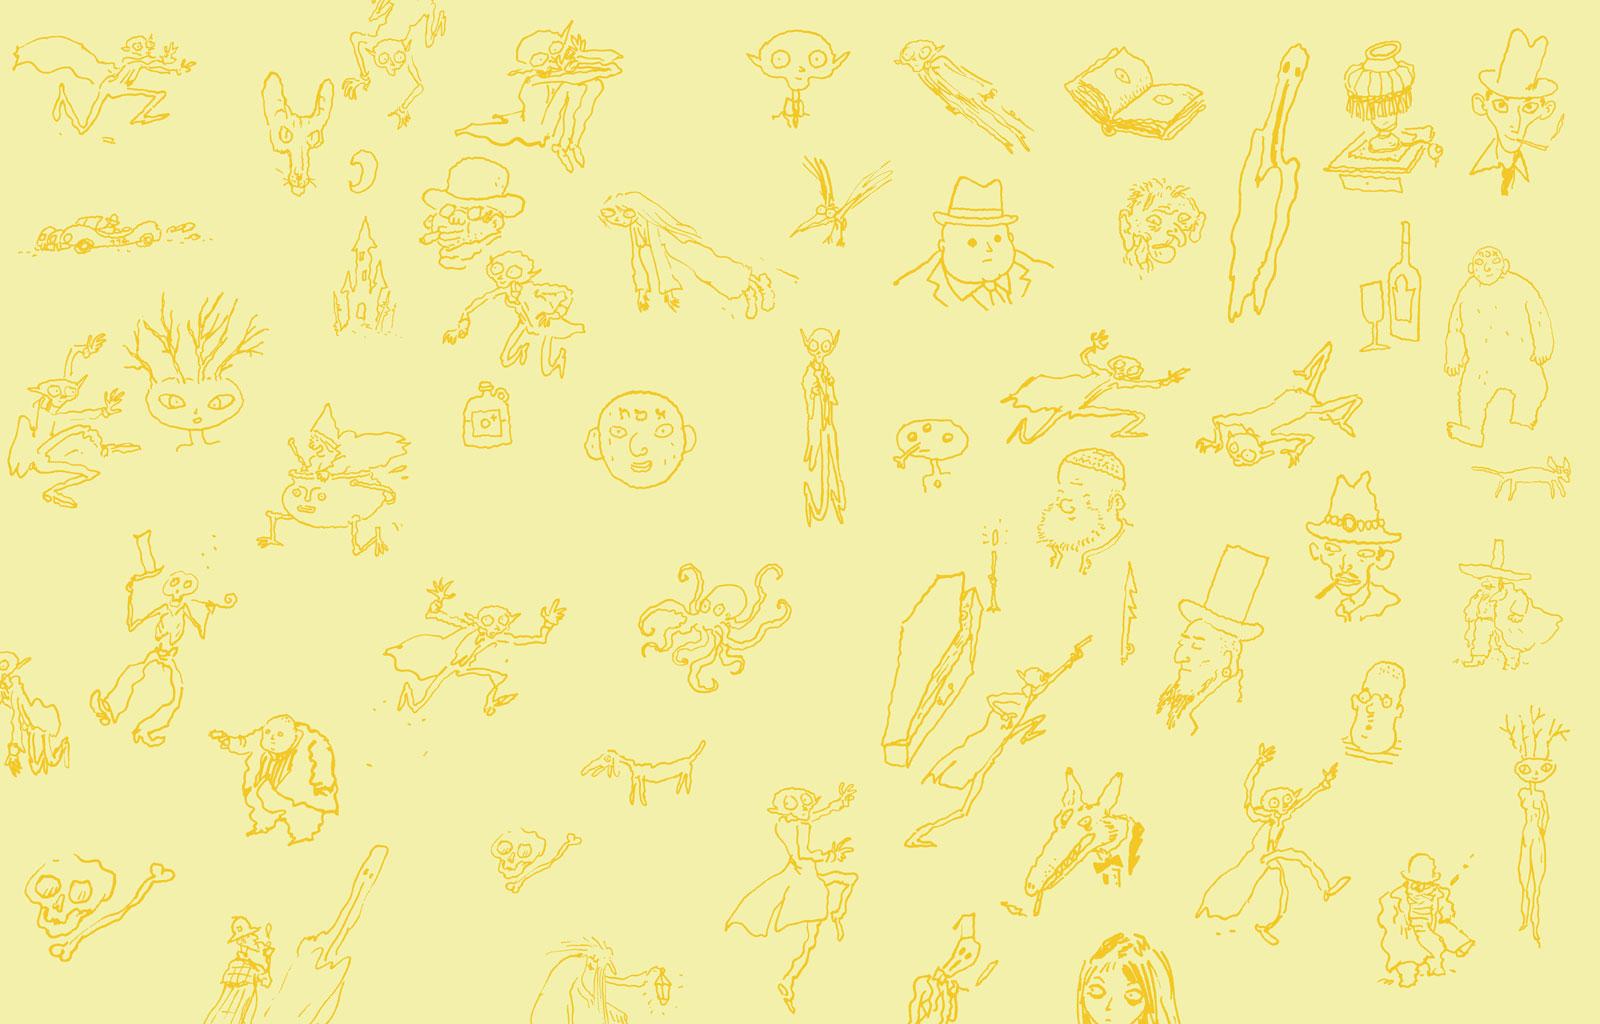 desktop yellow wallpapers yellow wallpaper yellow background hd 10jpg 1600x1024